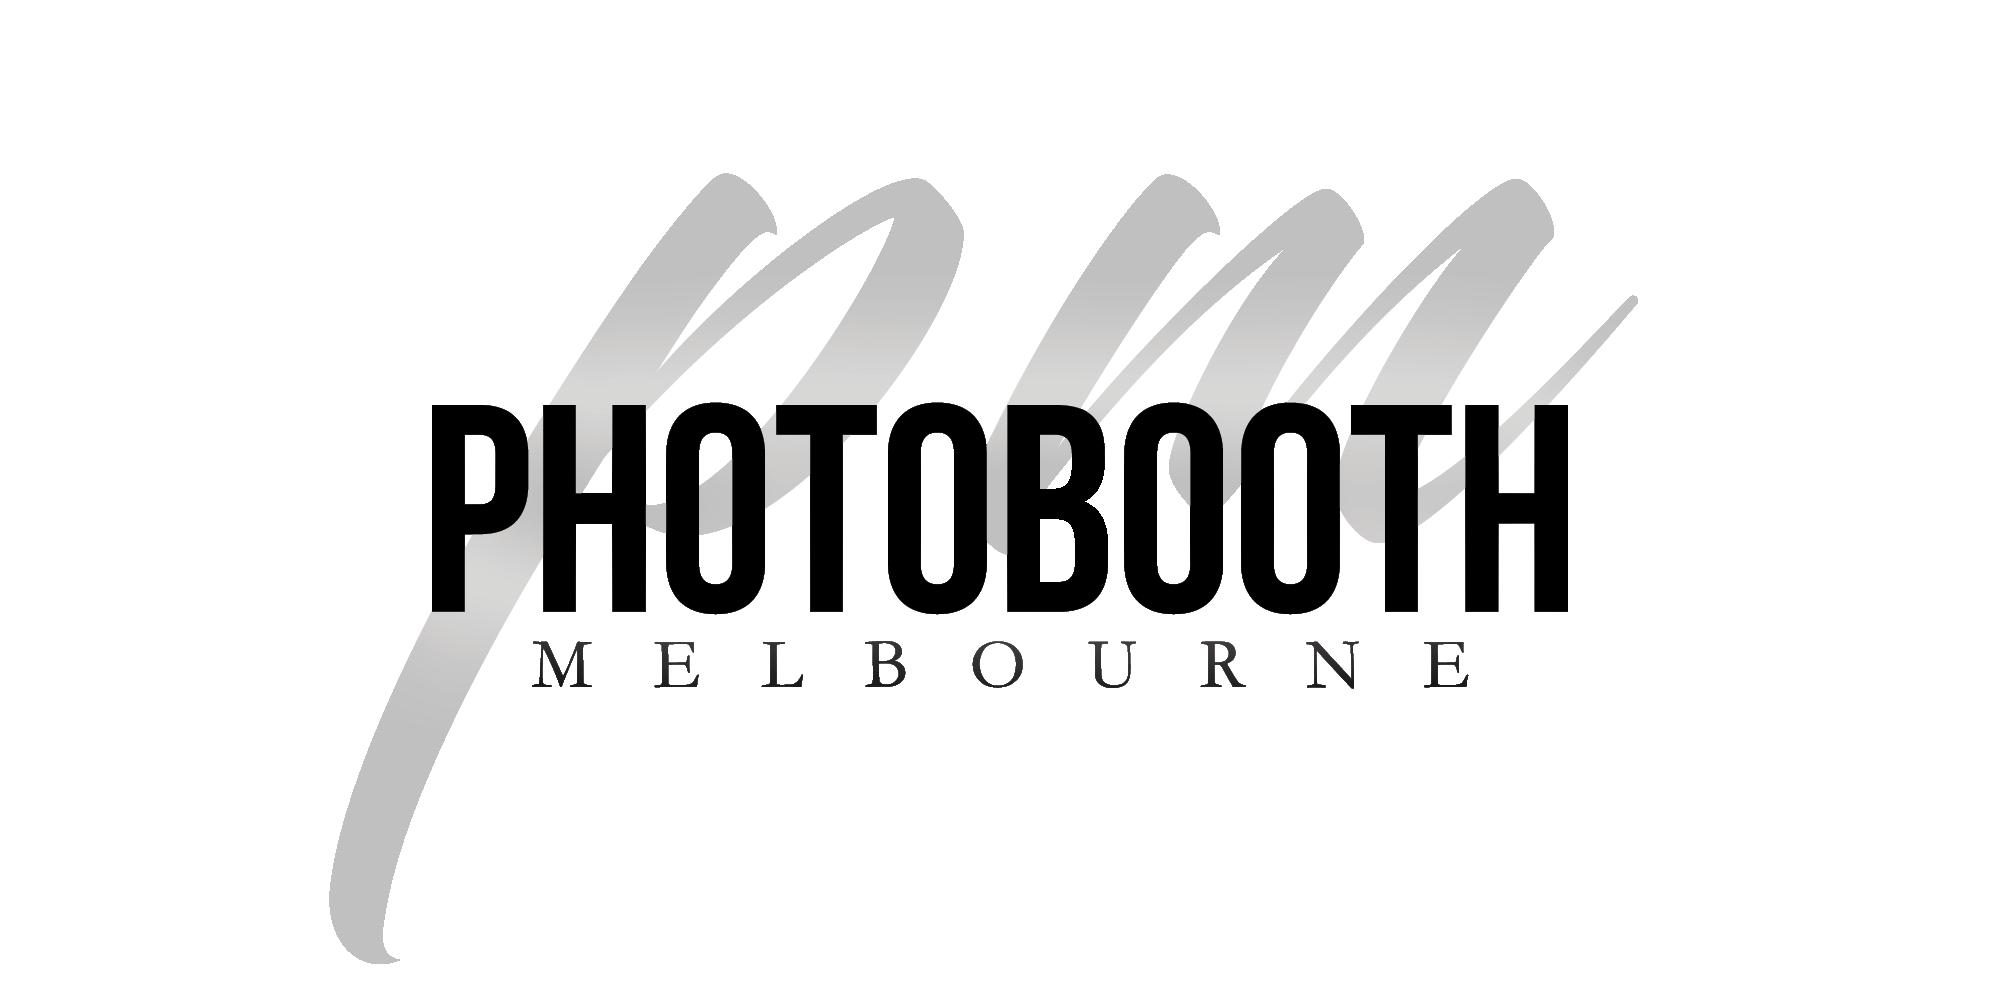 Photobooth Melbourne